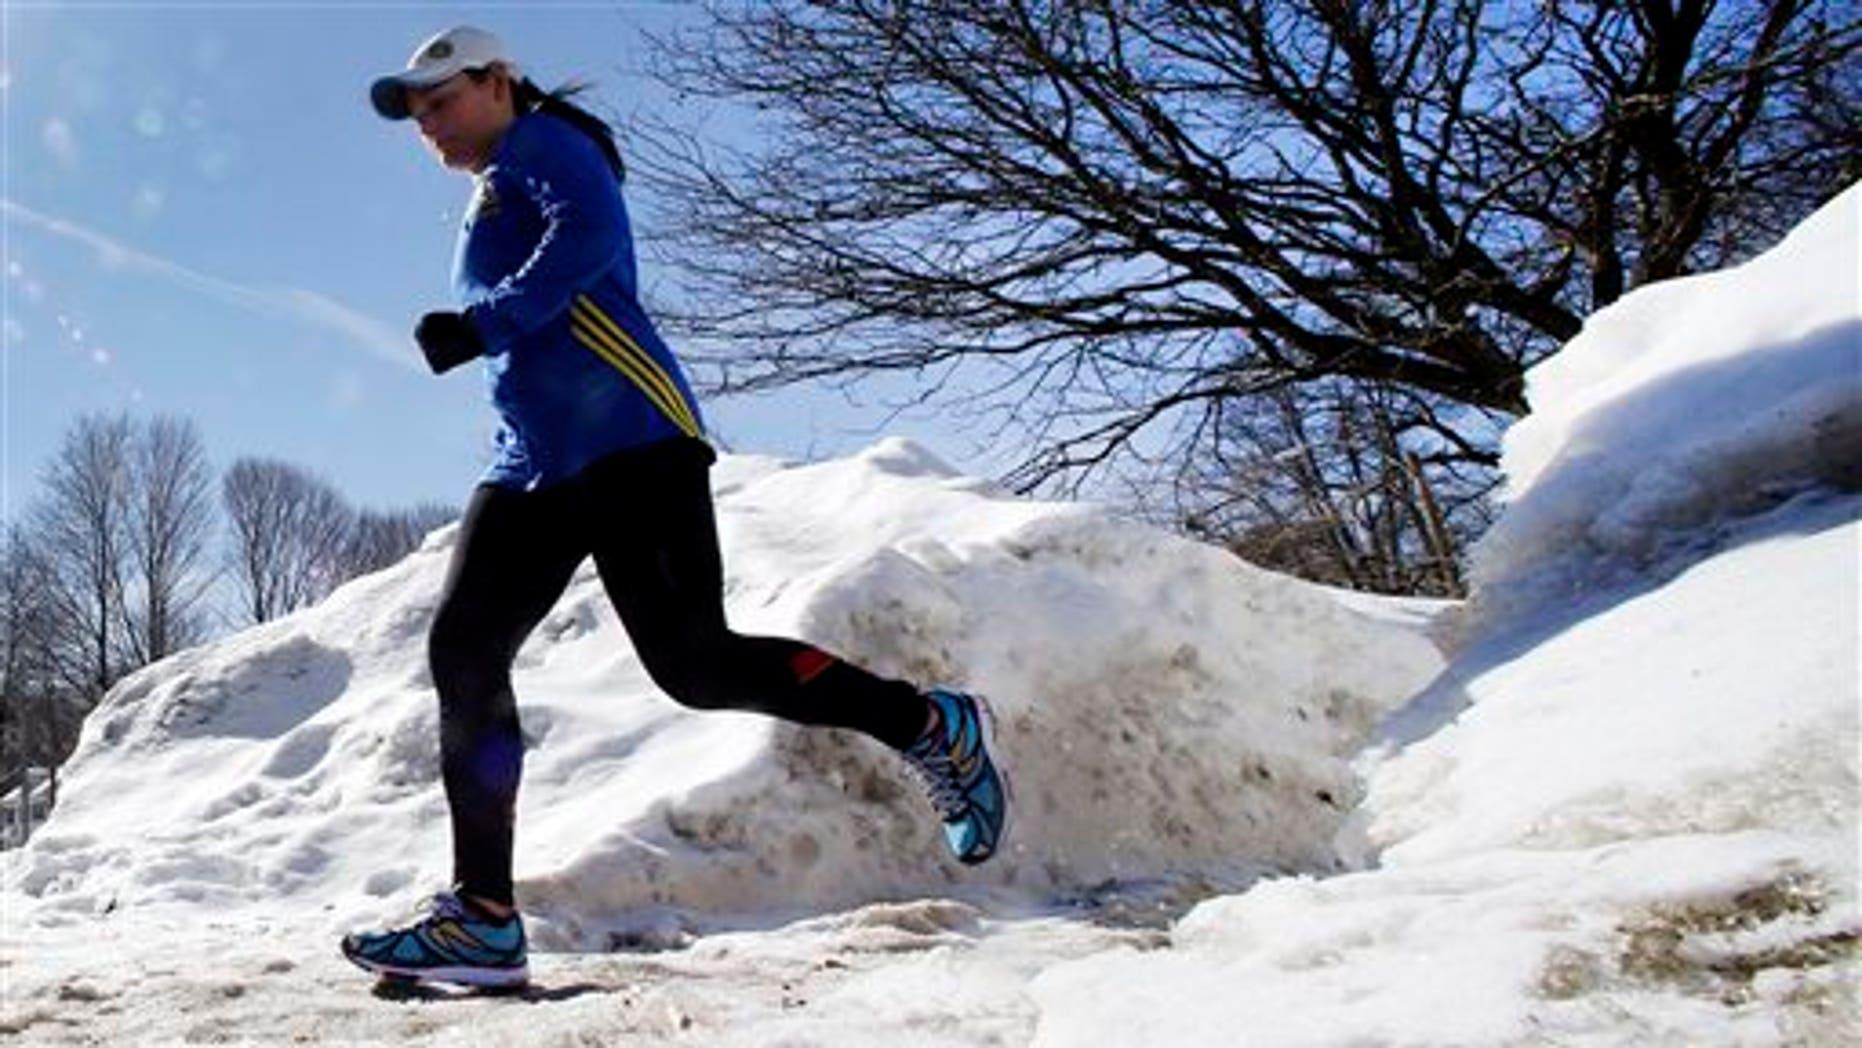 Runner Becca Pizzi, 34, trains along Heartbreak Hill in Newton, Mass., Friday, Feb. 27, 2015. (AP Photo/Elise Amendola)